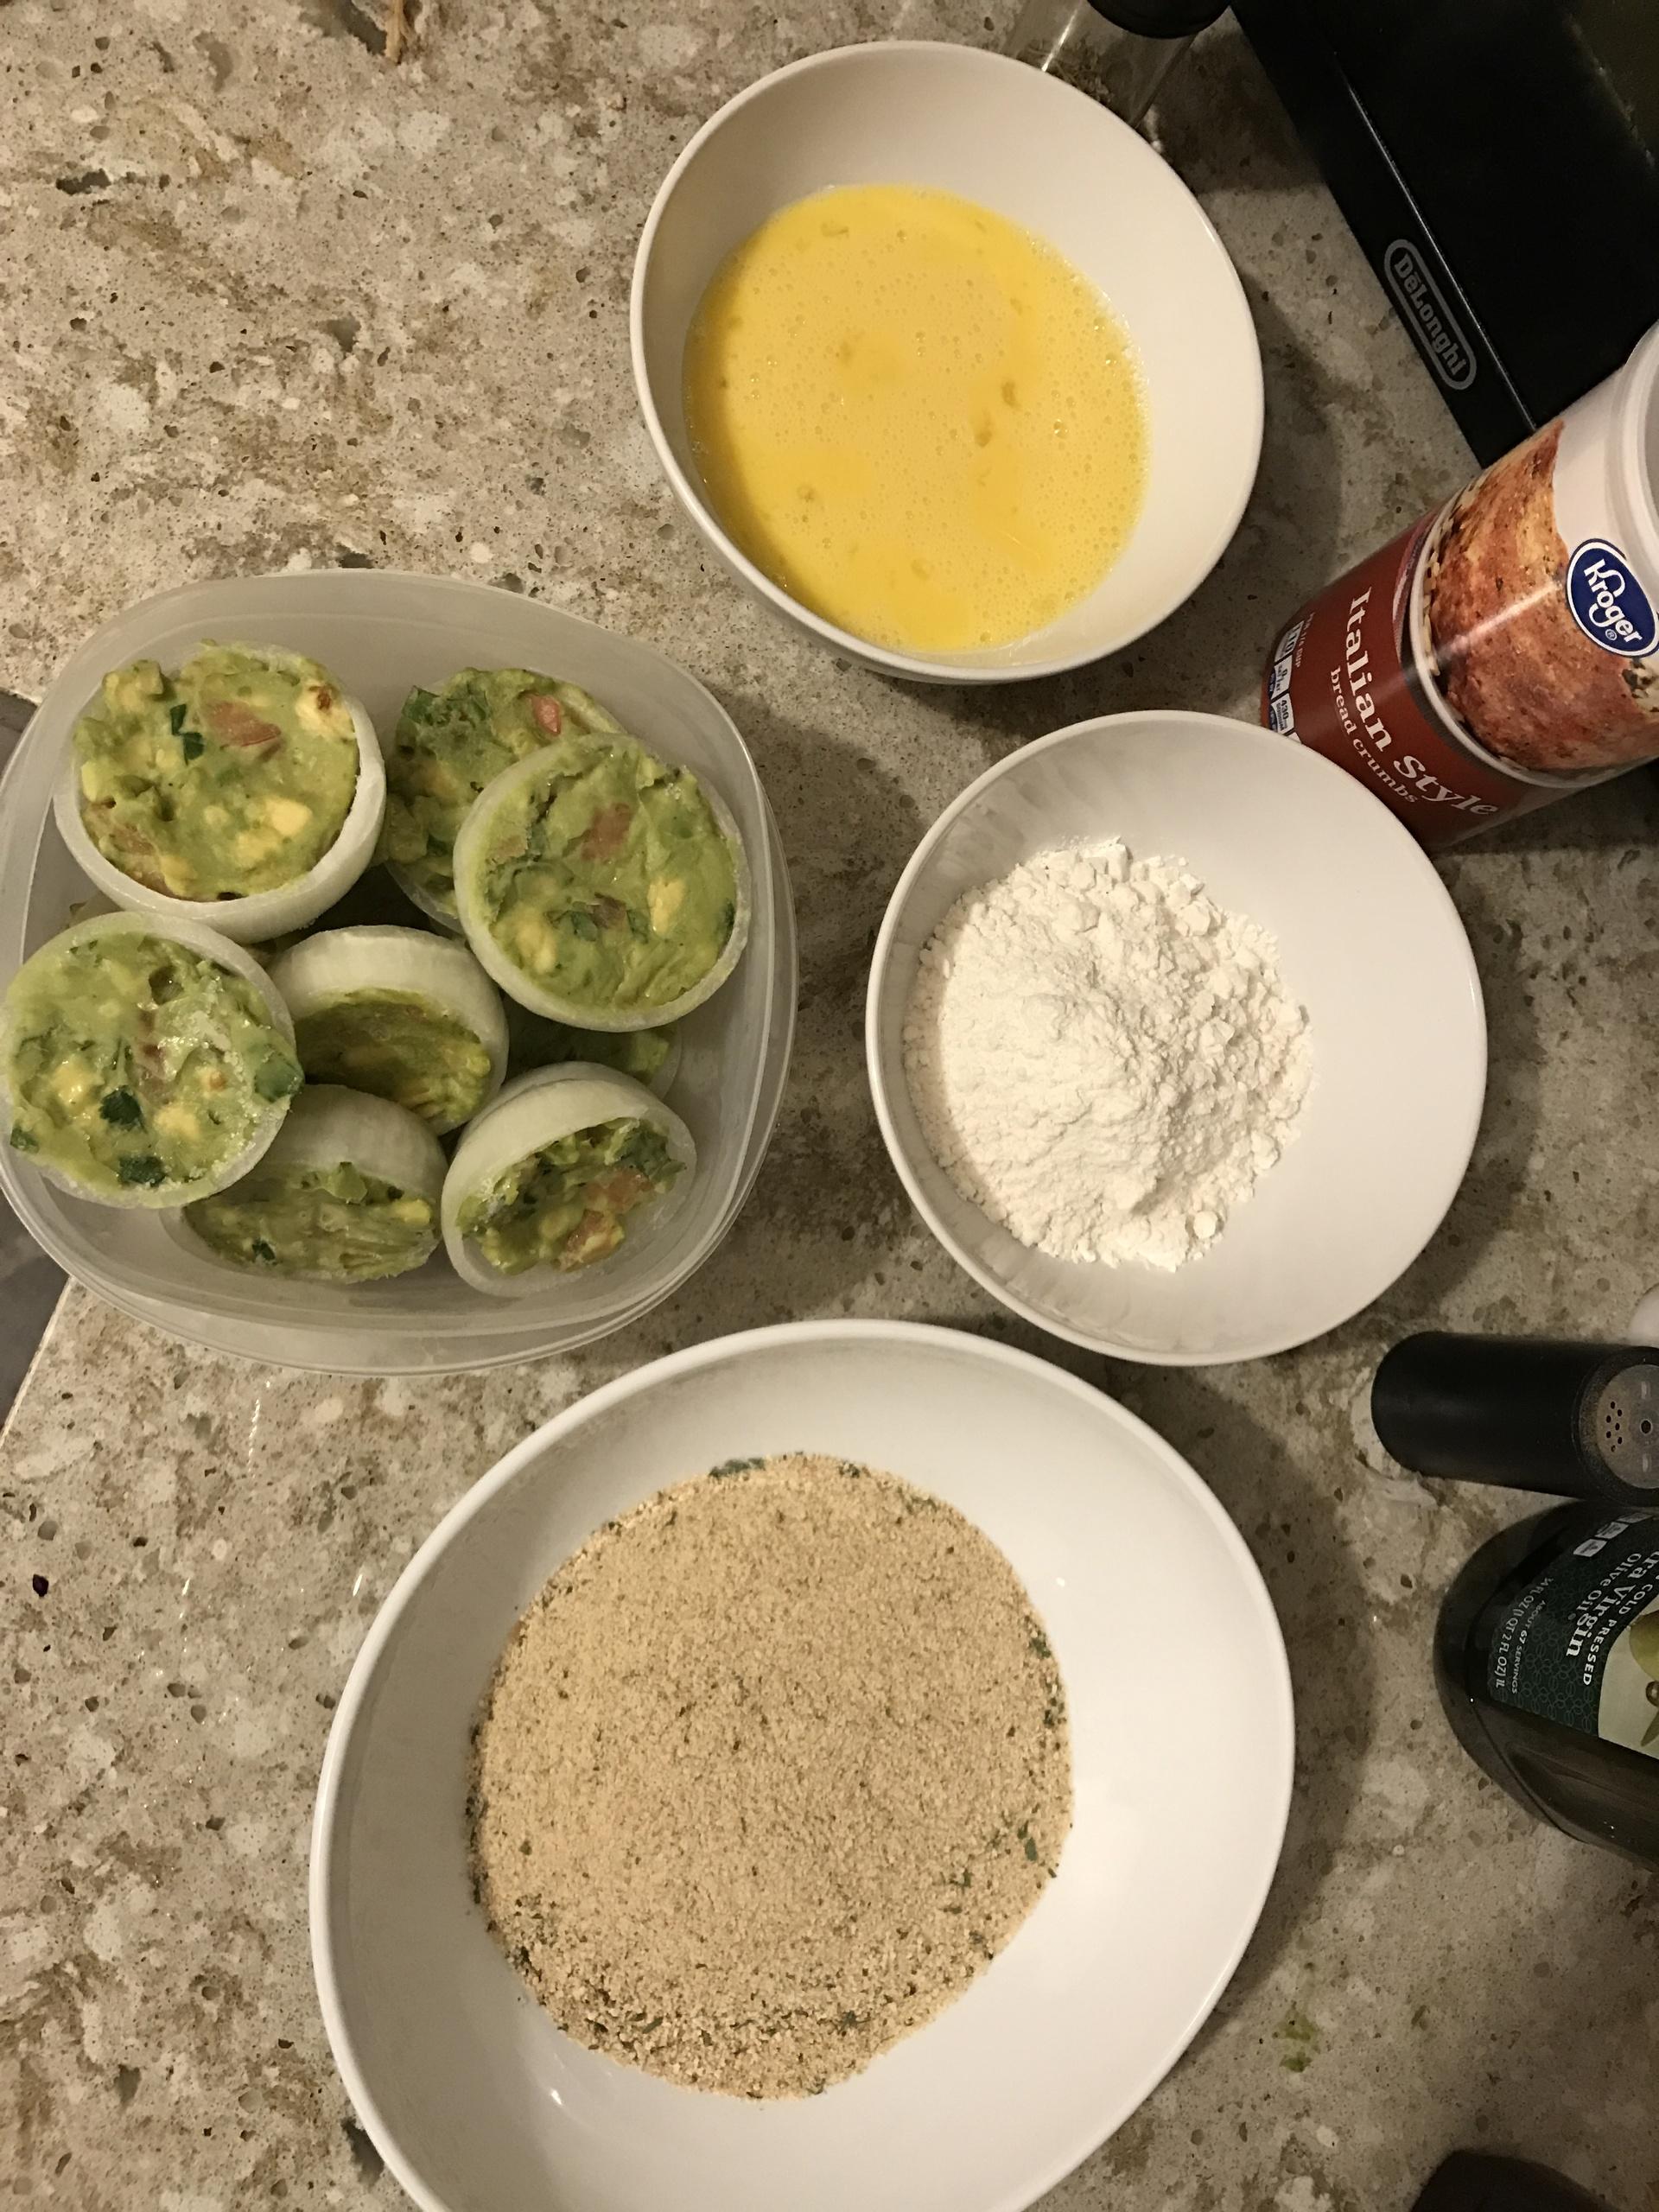 Making guacamole onion rings | brian.holt, bowl, food, nobody